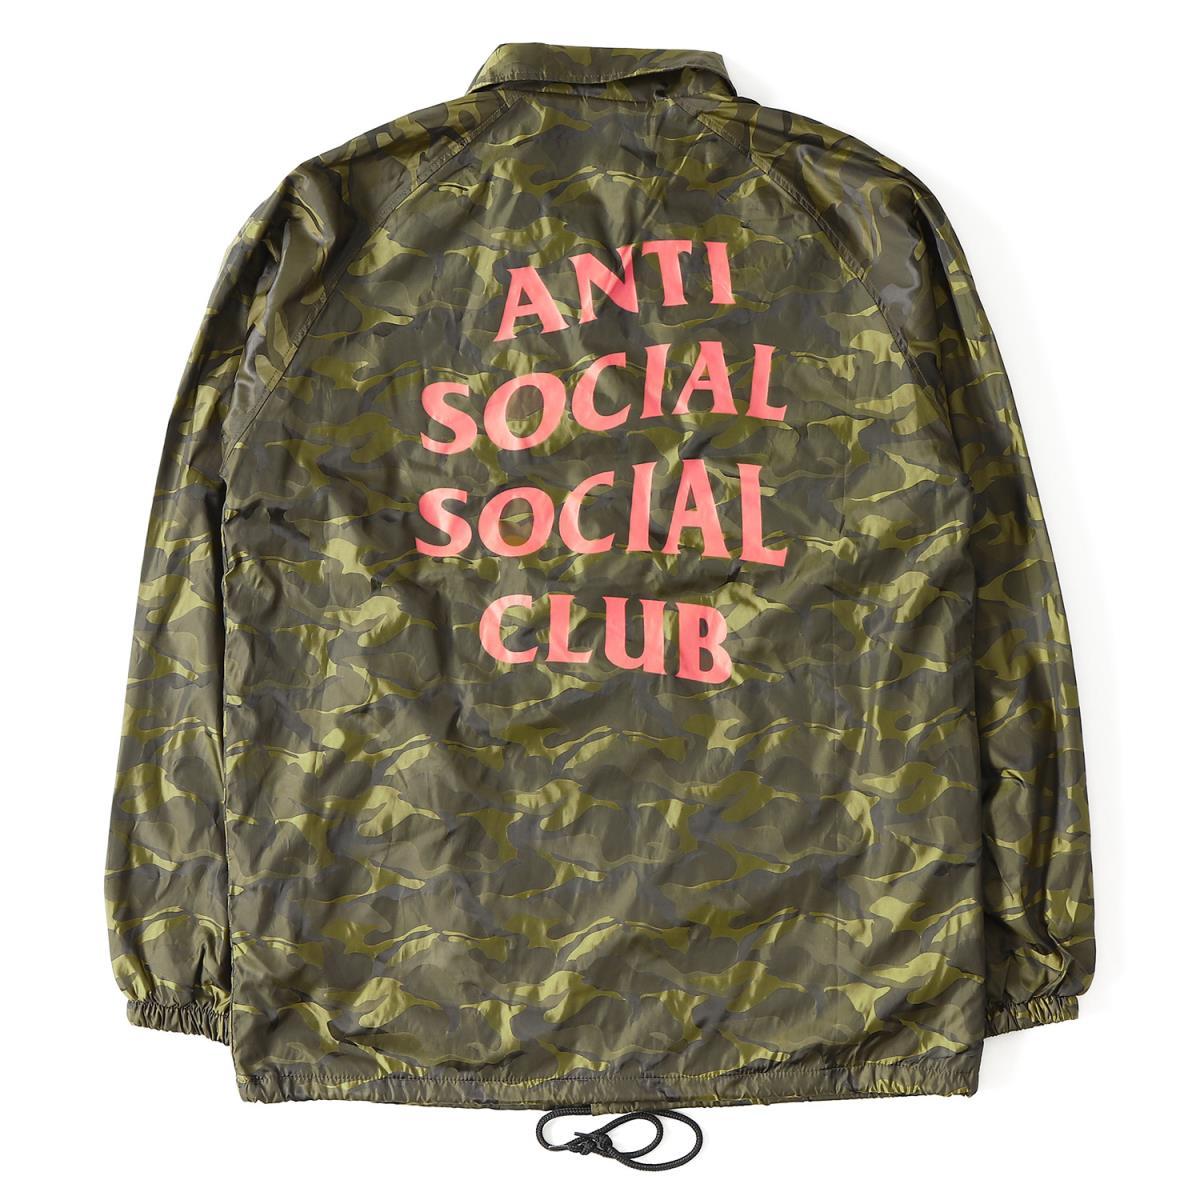 2afdba5ebd21 Anti Social Social Club (antisocial social club) 17S S camouflage pattern  brand logo coach jacket (Camo Coach Jacket) camouflage XL